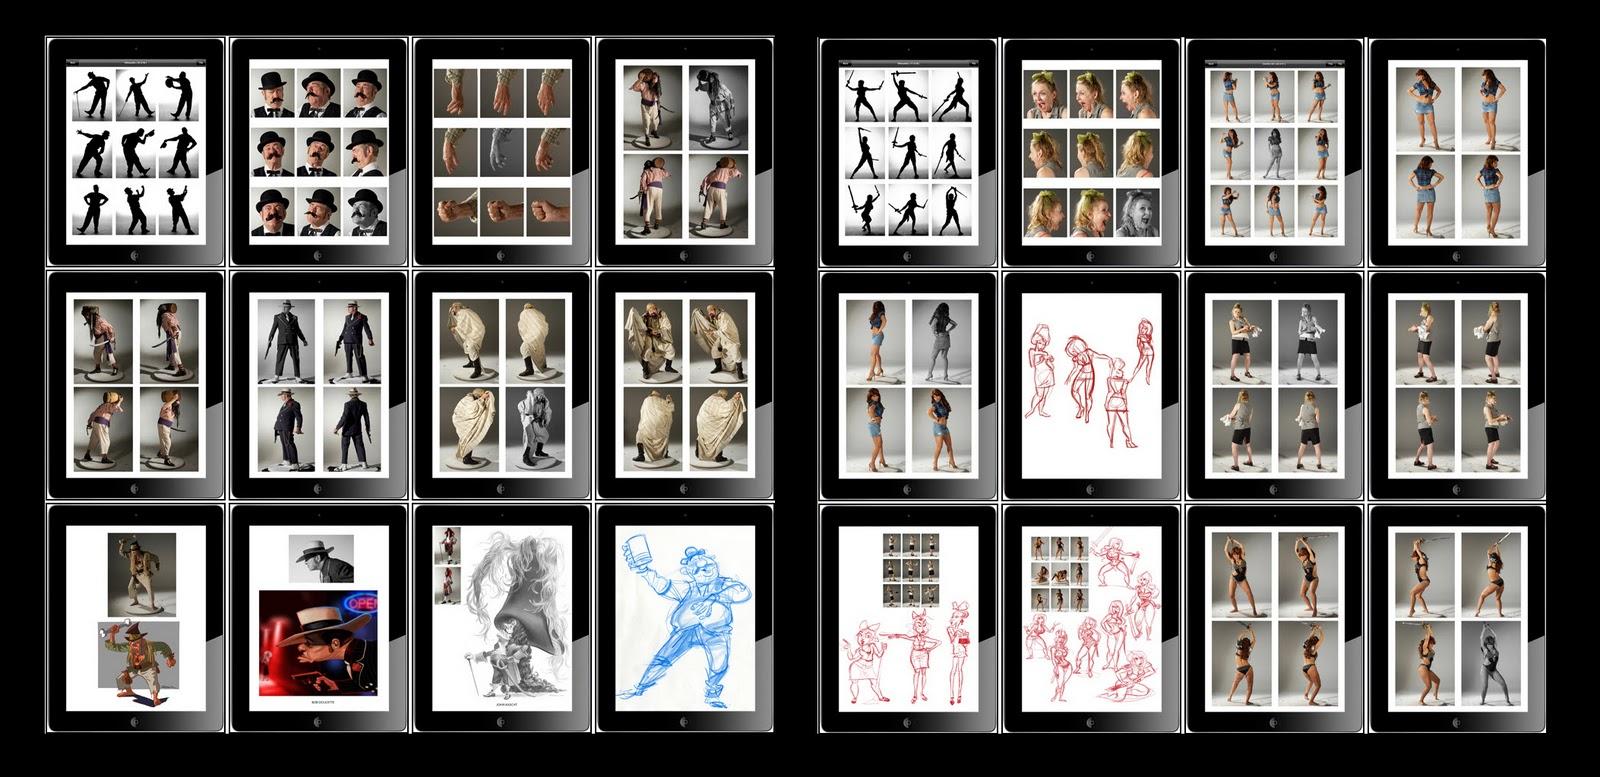 Stephen Silver Character Design App : Character design artist interviews update on stephen silver